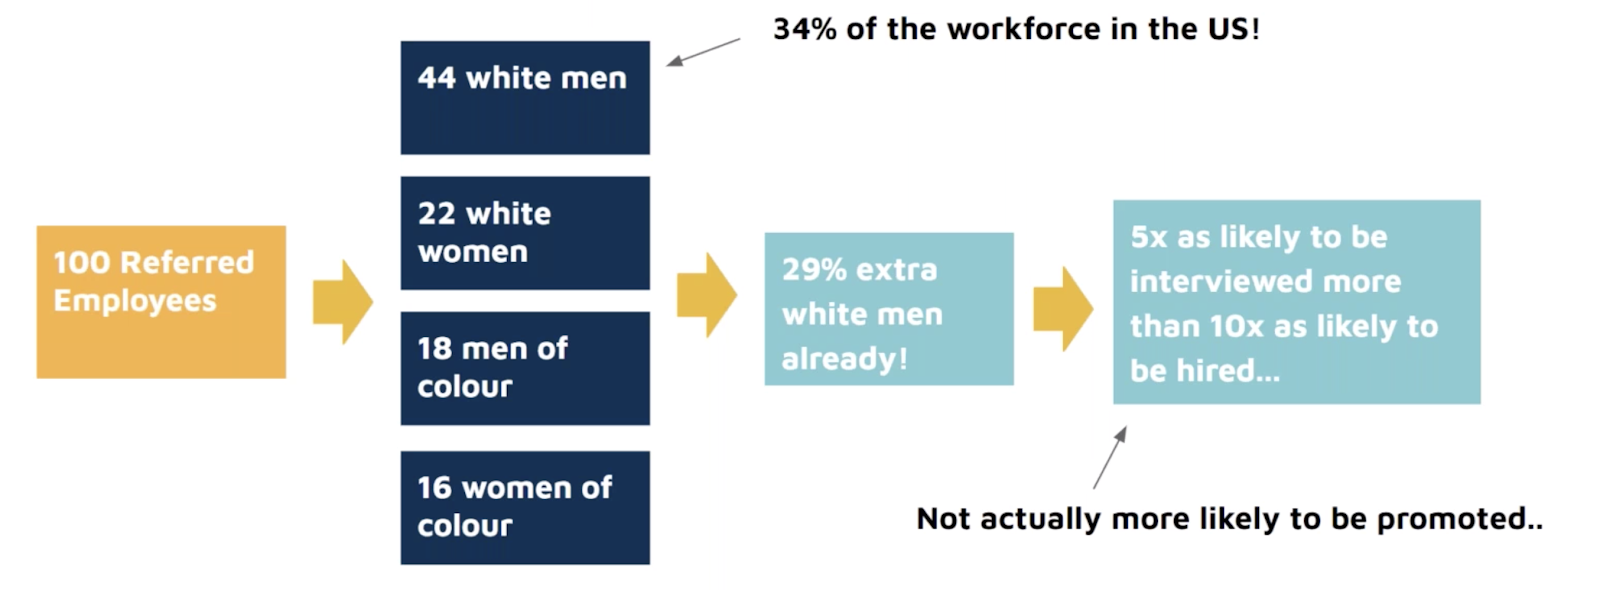 How referrals harm diversity